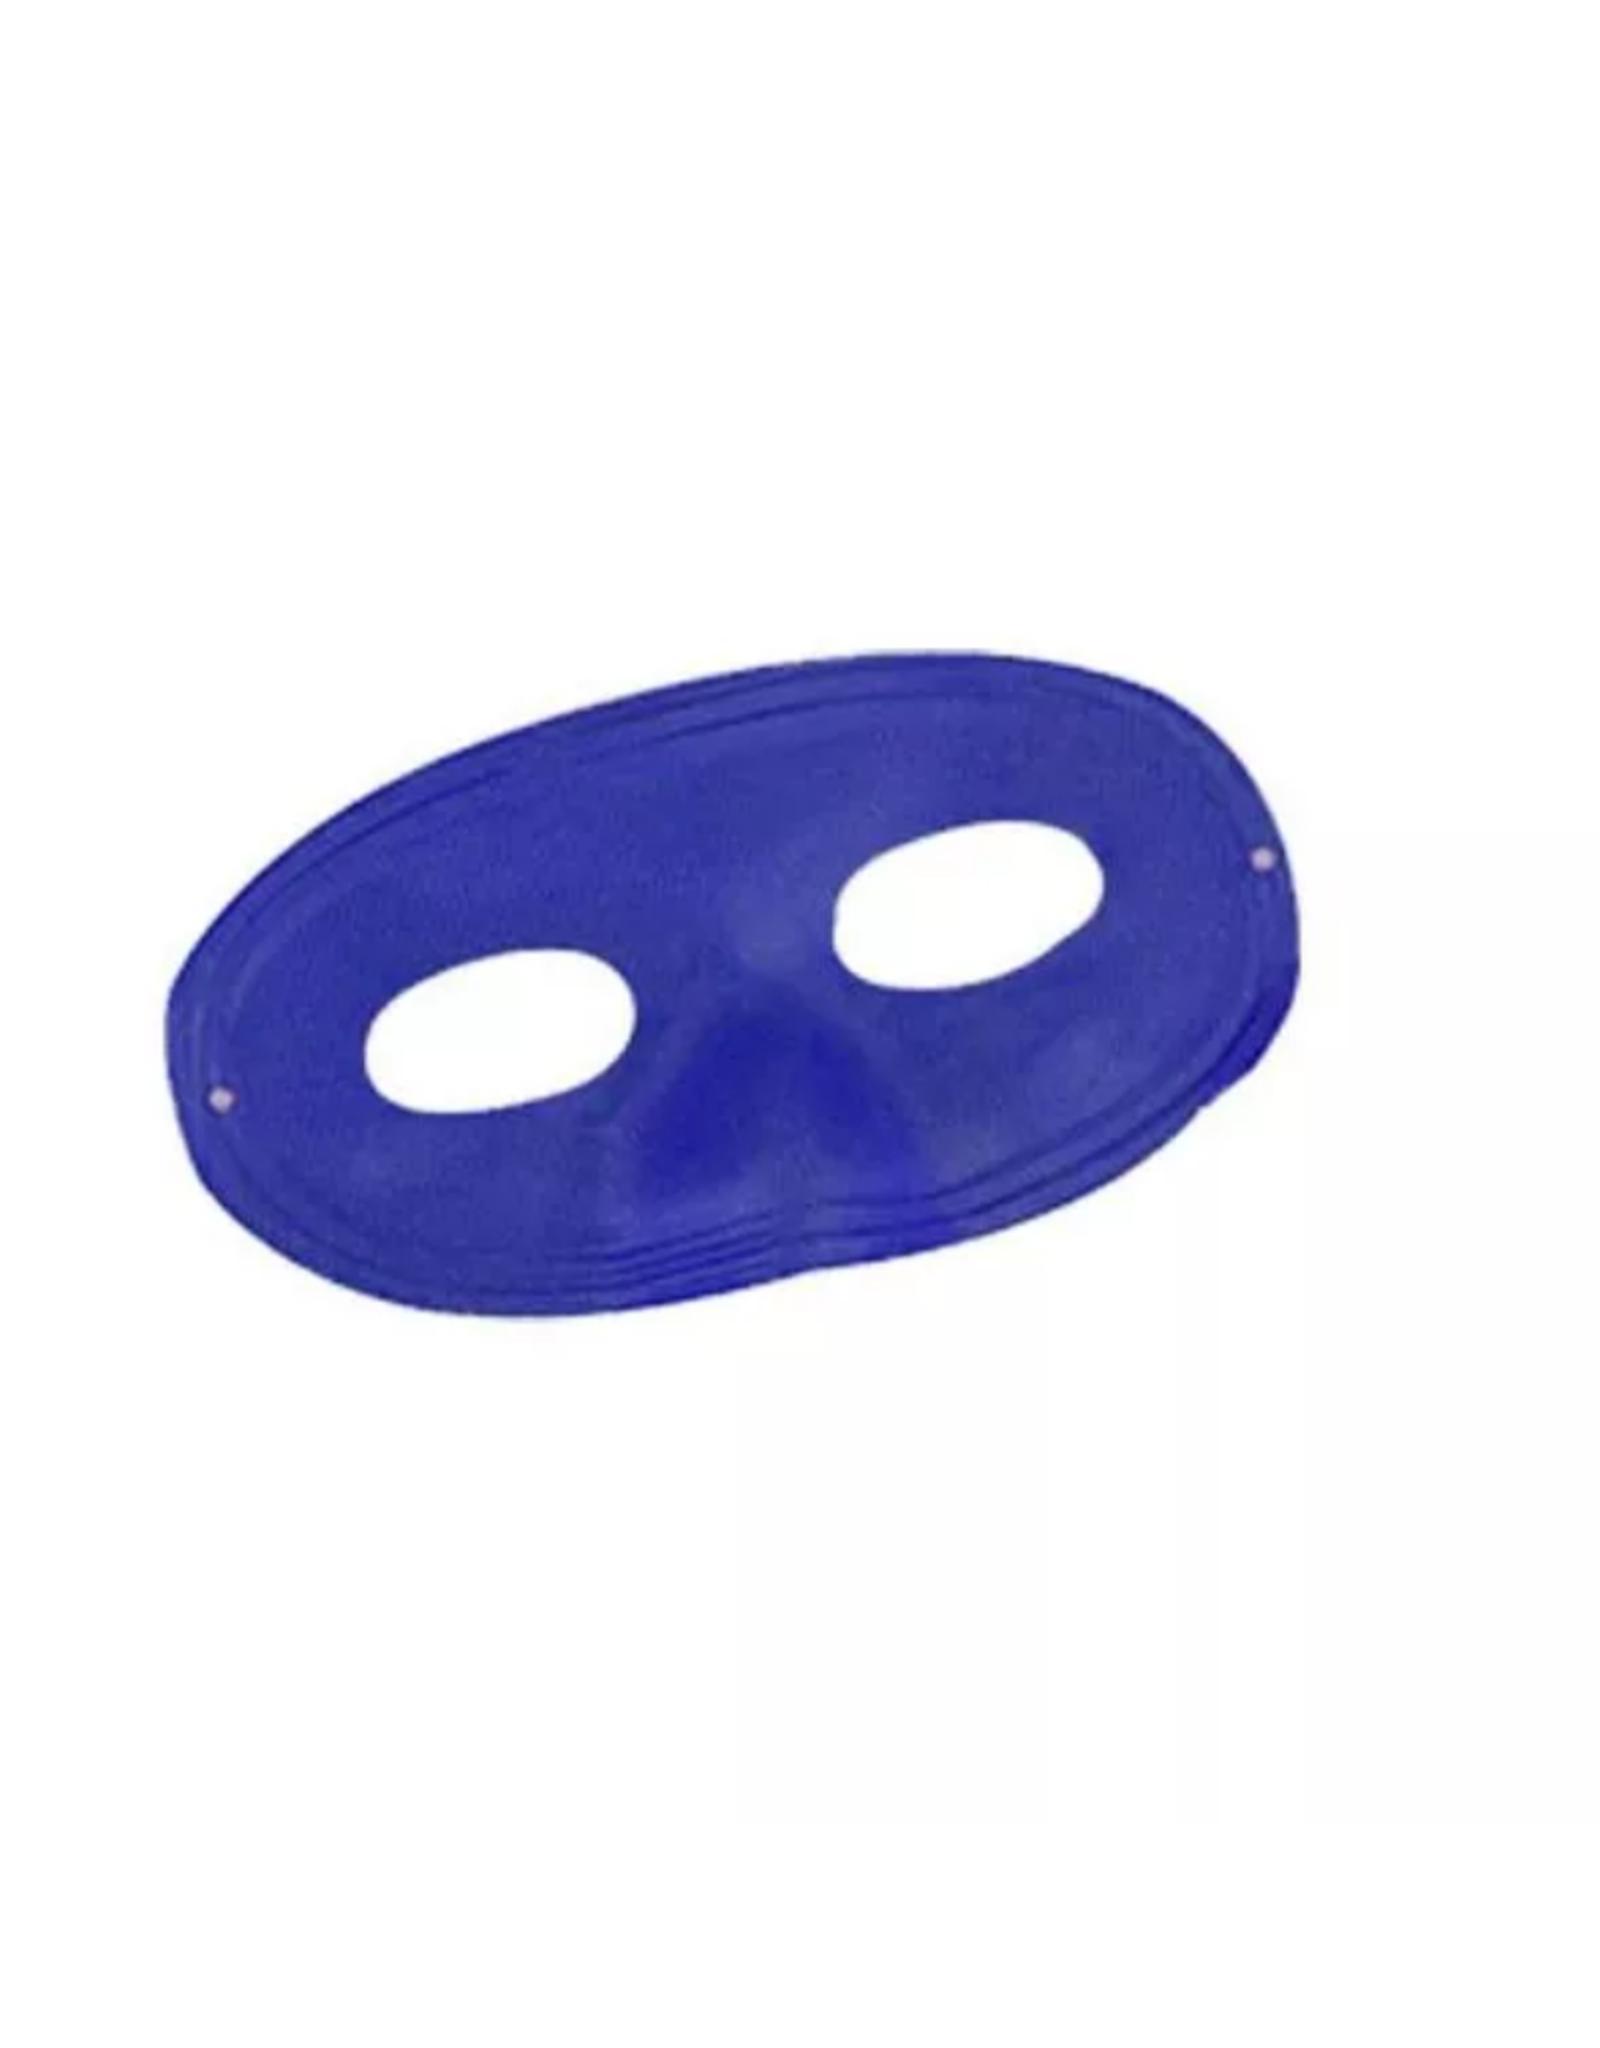 MASK-DOMINO, BLUE, D